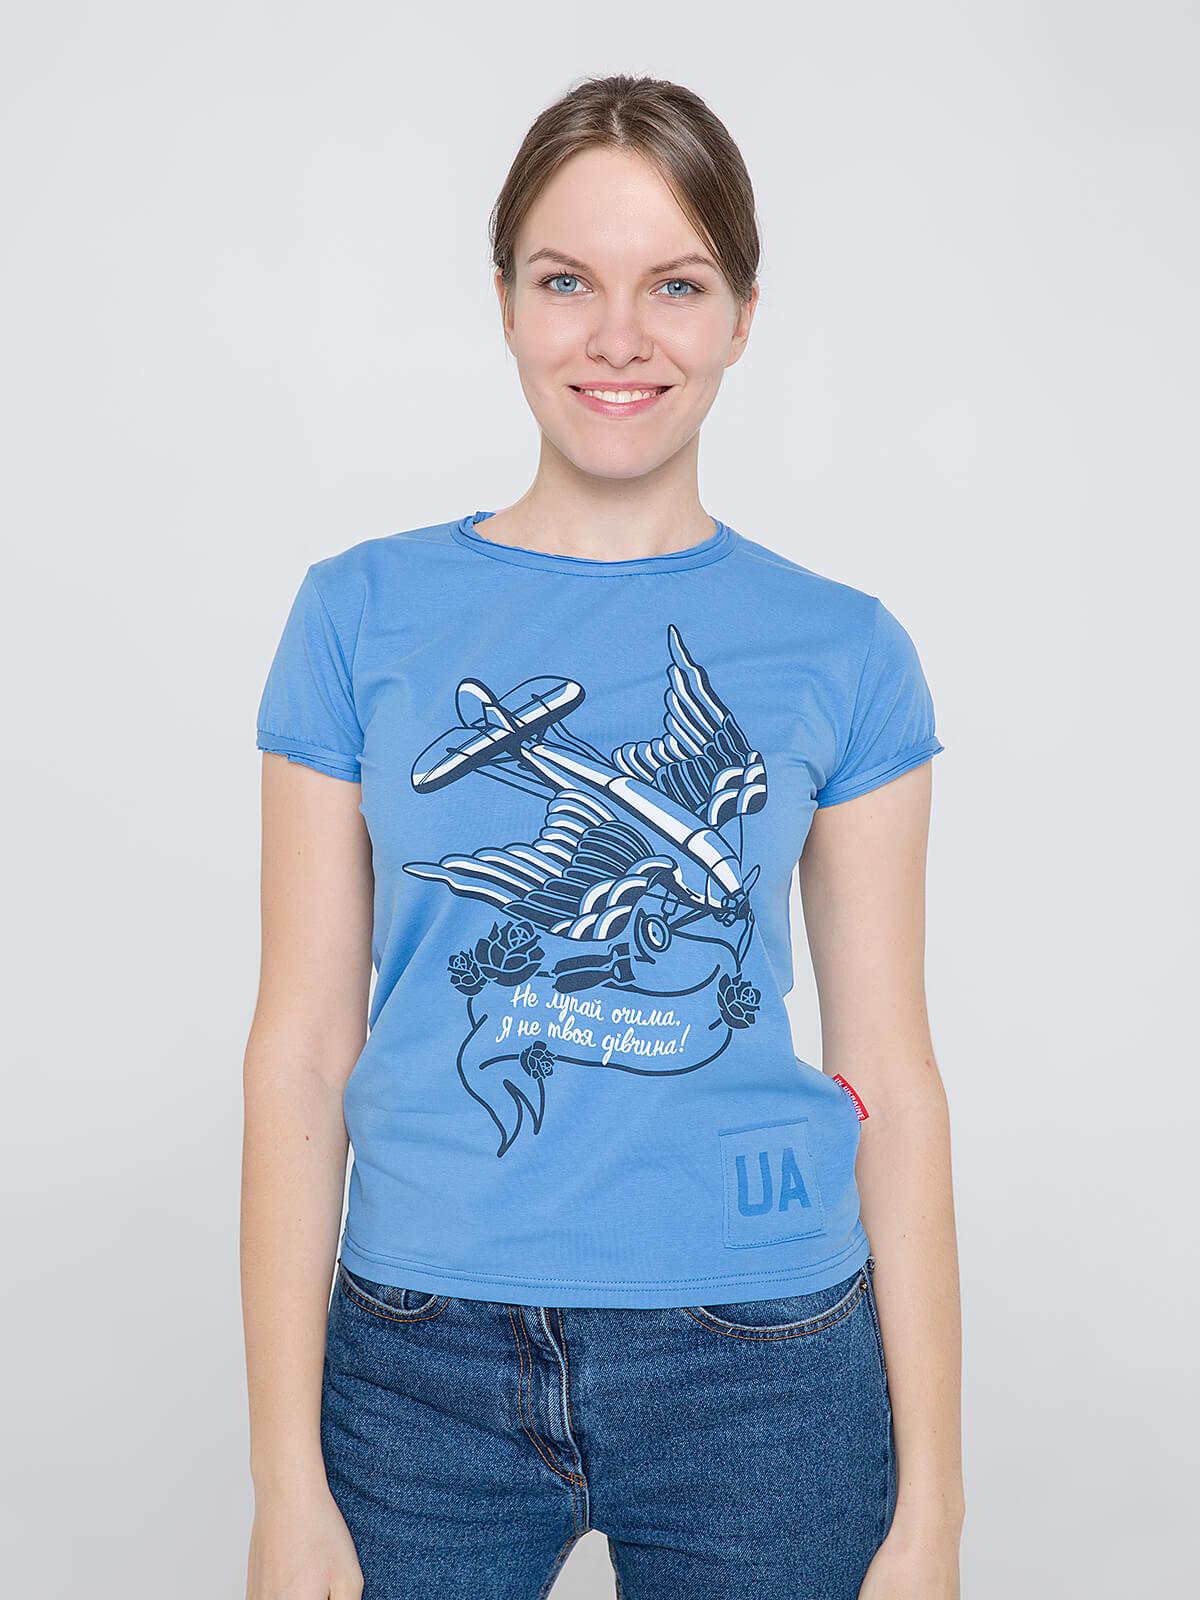 Women's T-Shirt Wild Wings. Color sky blue. Material: 95% cotton, 5% spandex.